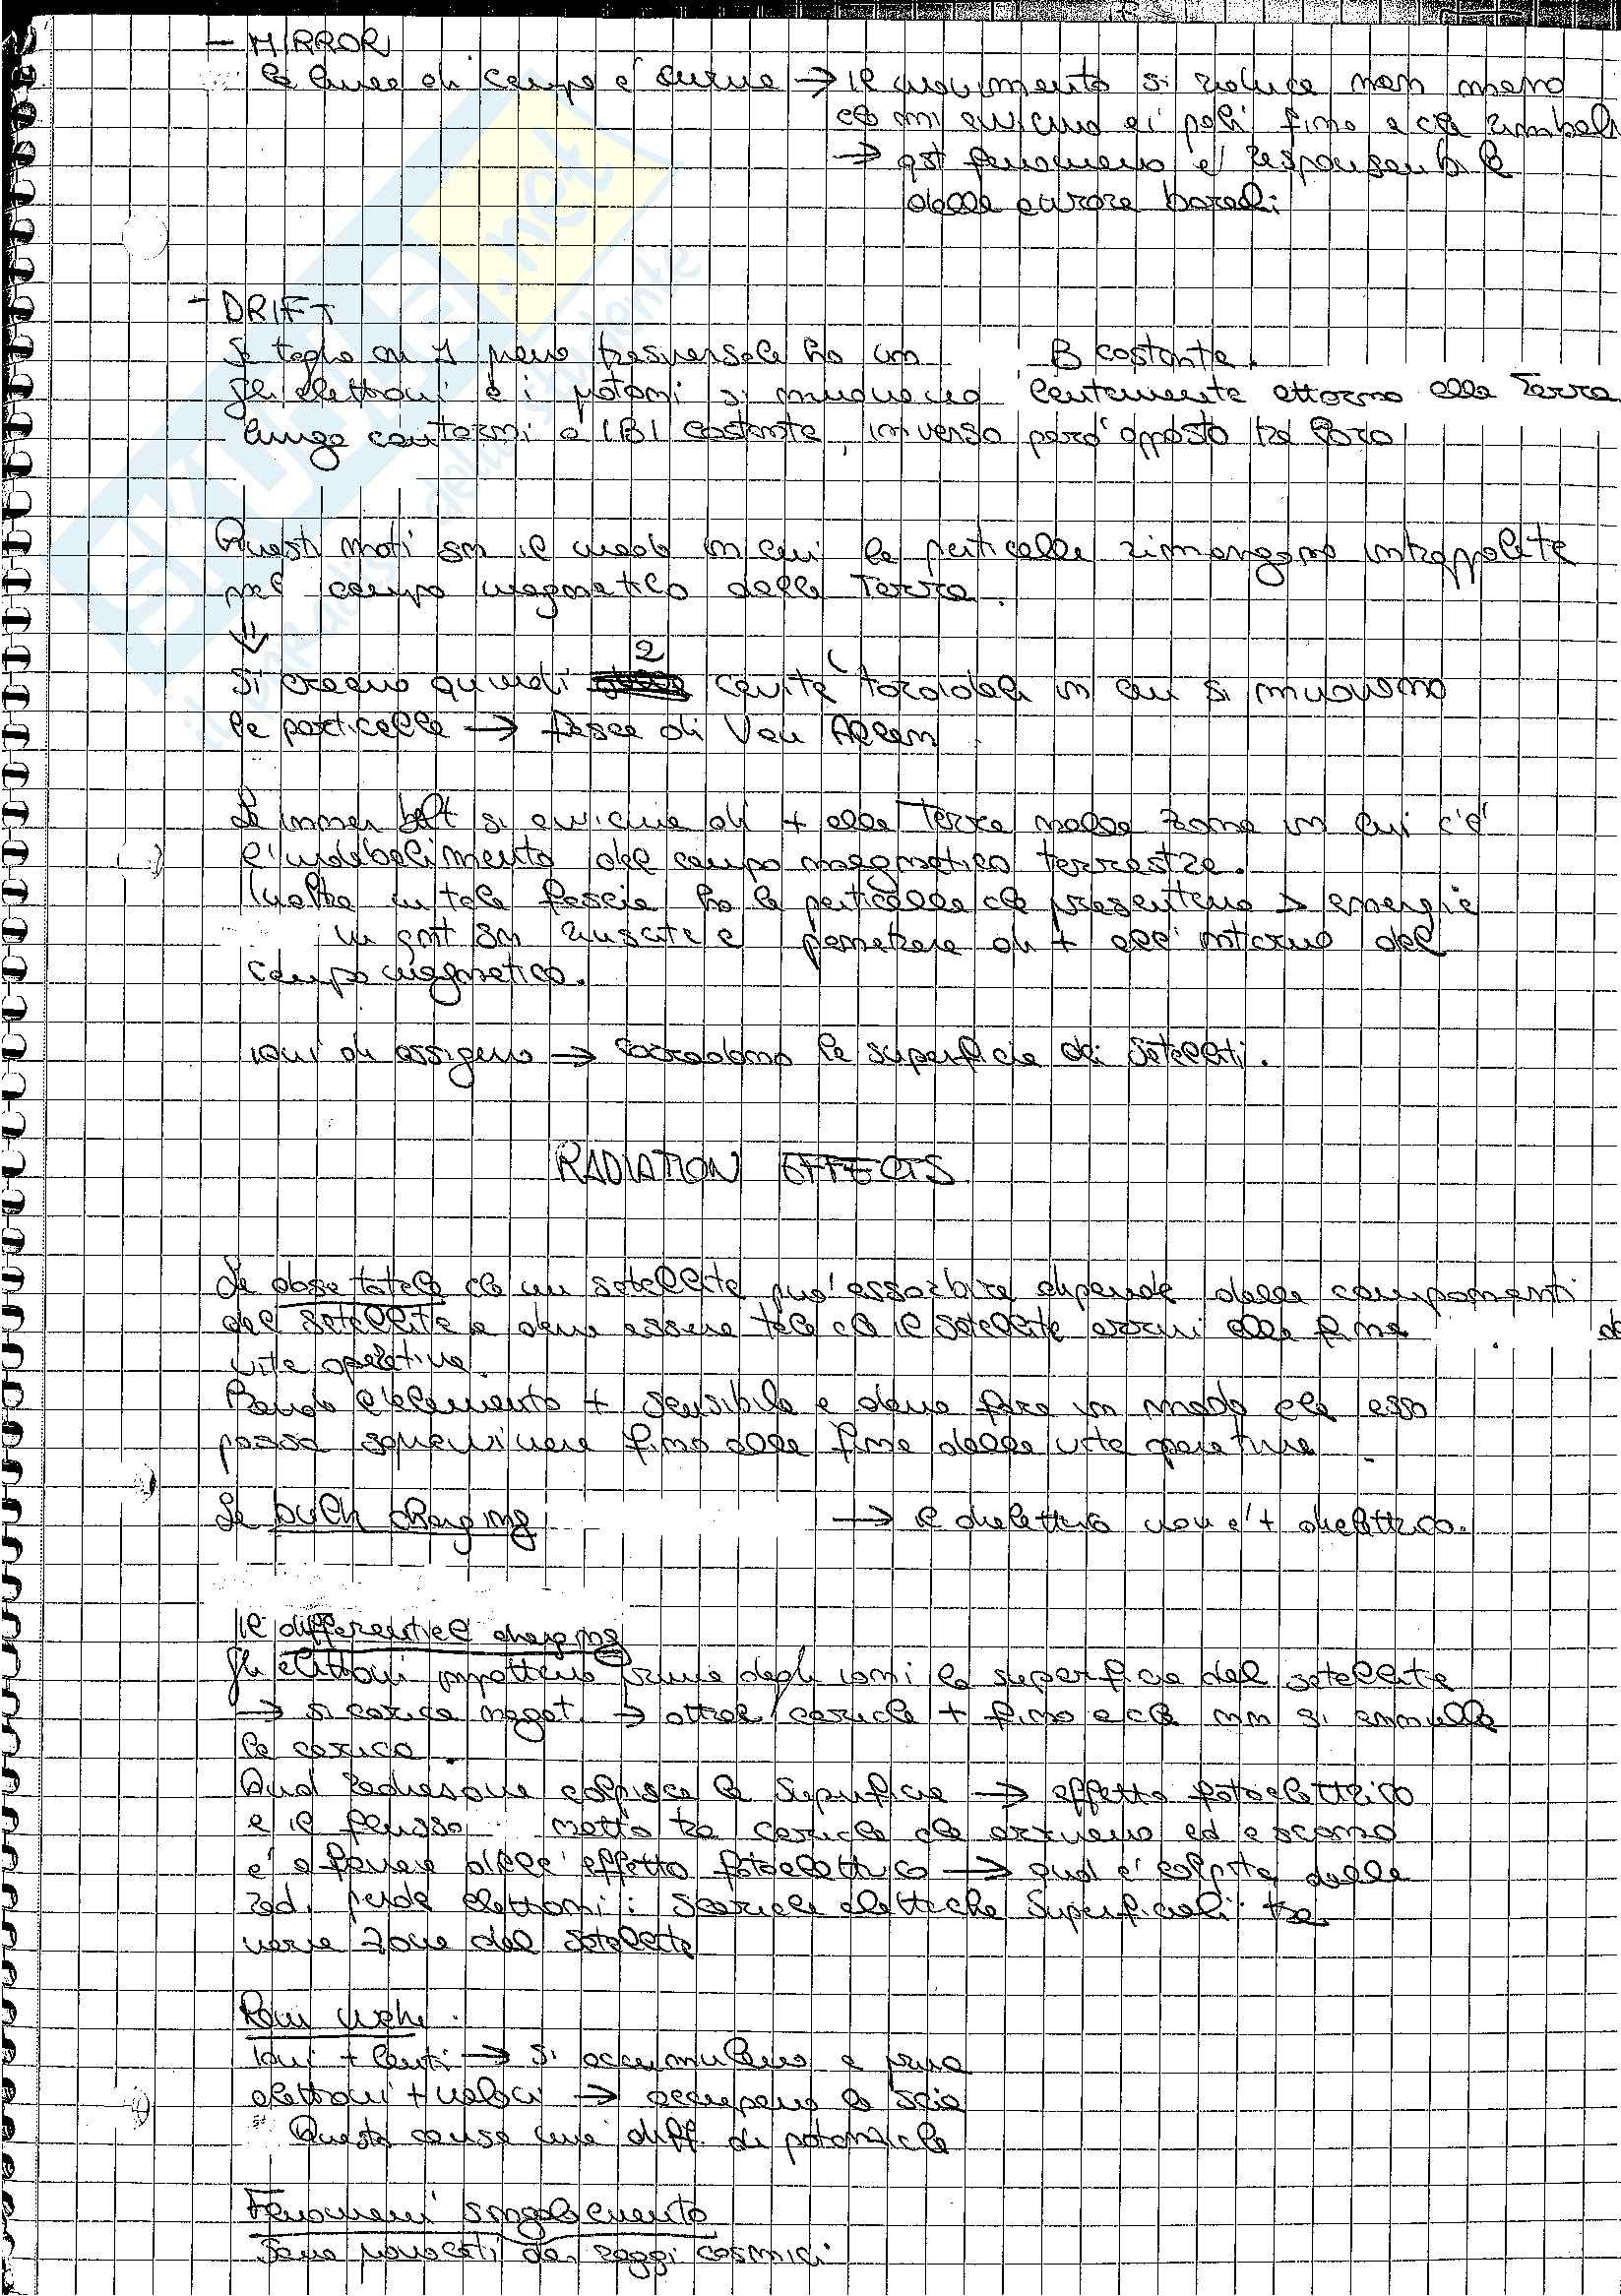 Sistemi spaziali - Appunti Pag. 26